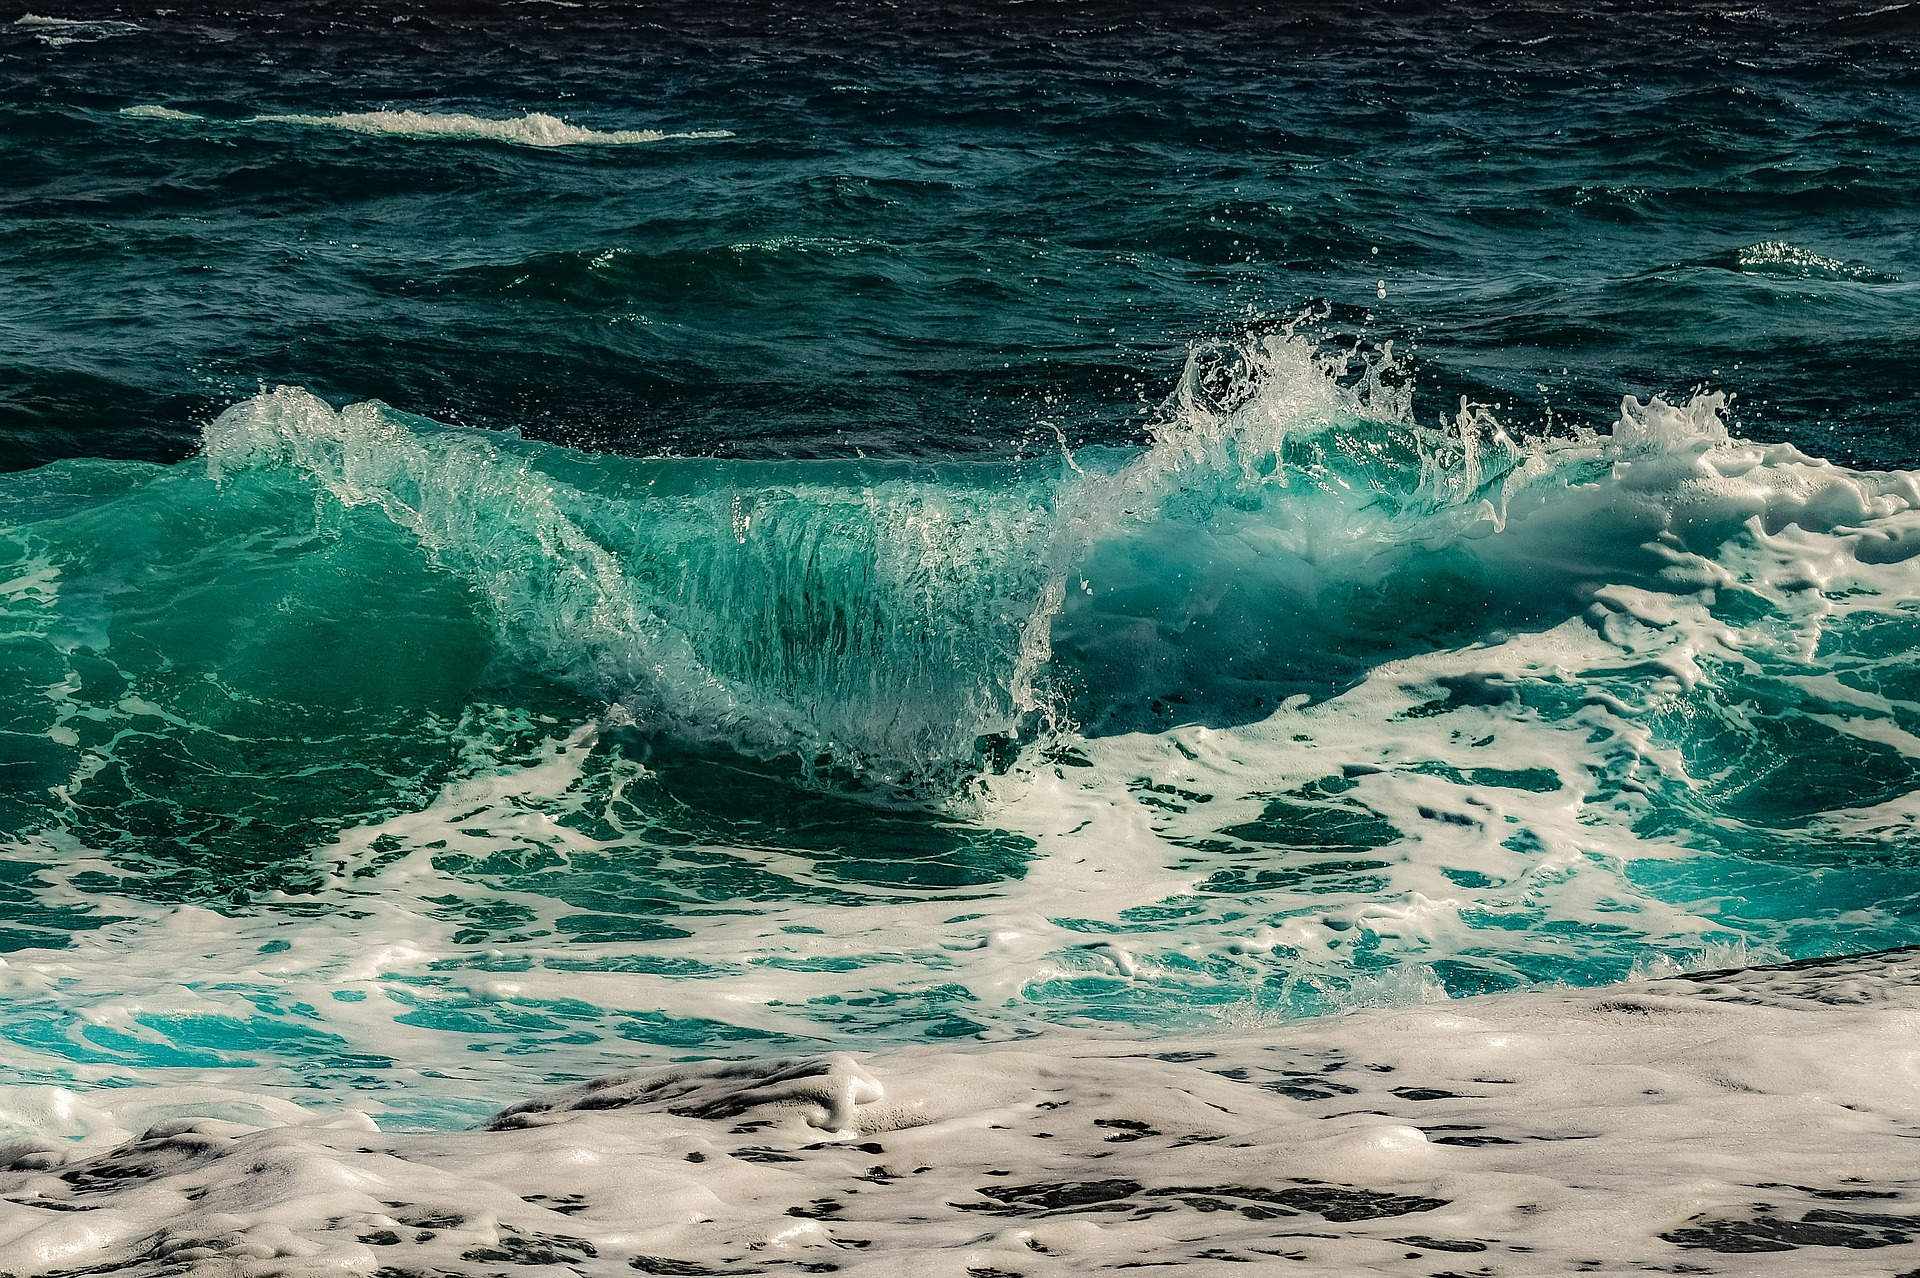 surf-3450584_1920